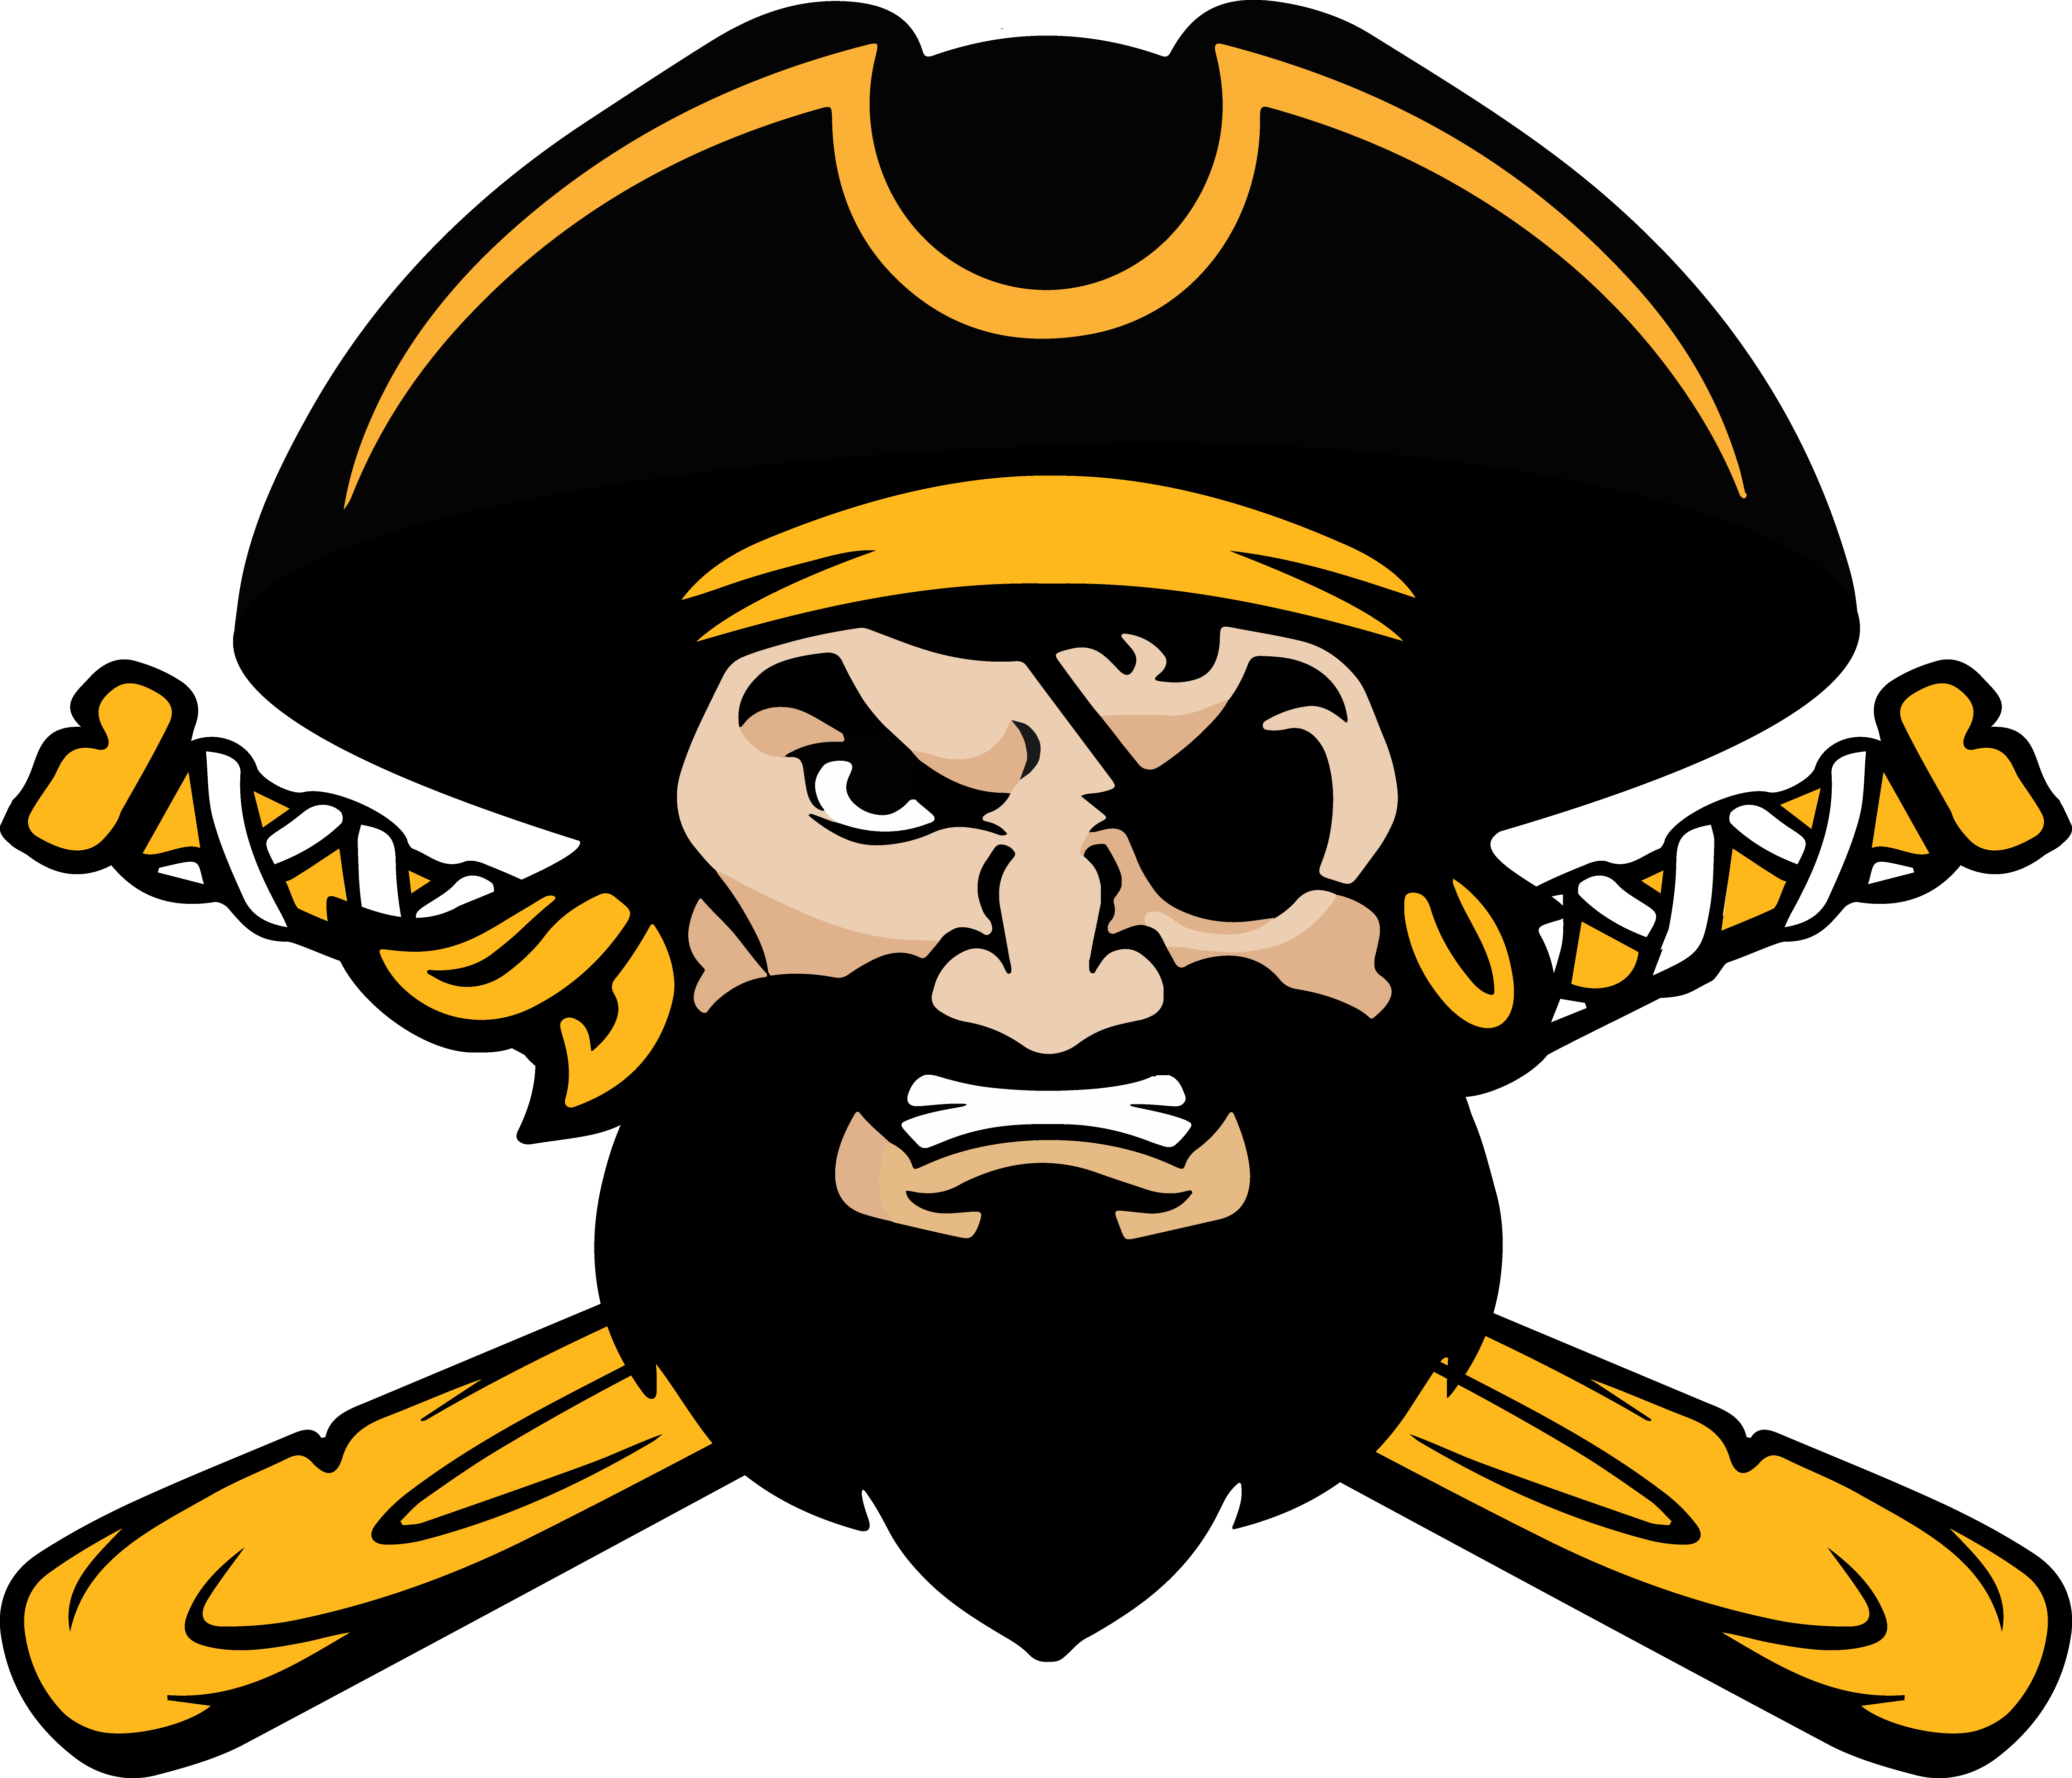 Pirates baseball clipart image free library Mid Atlantic Pirates Coaches image free library